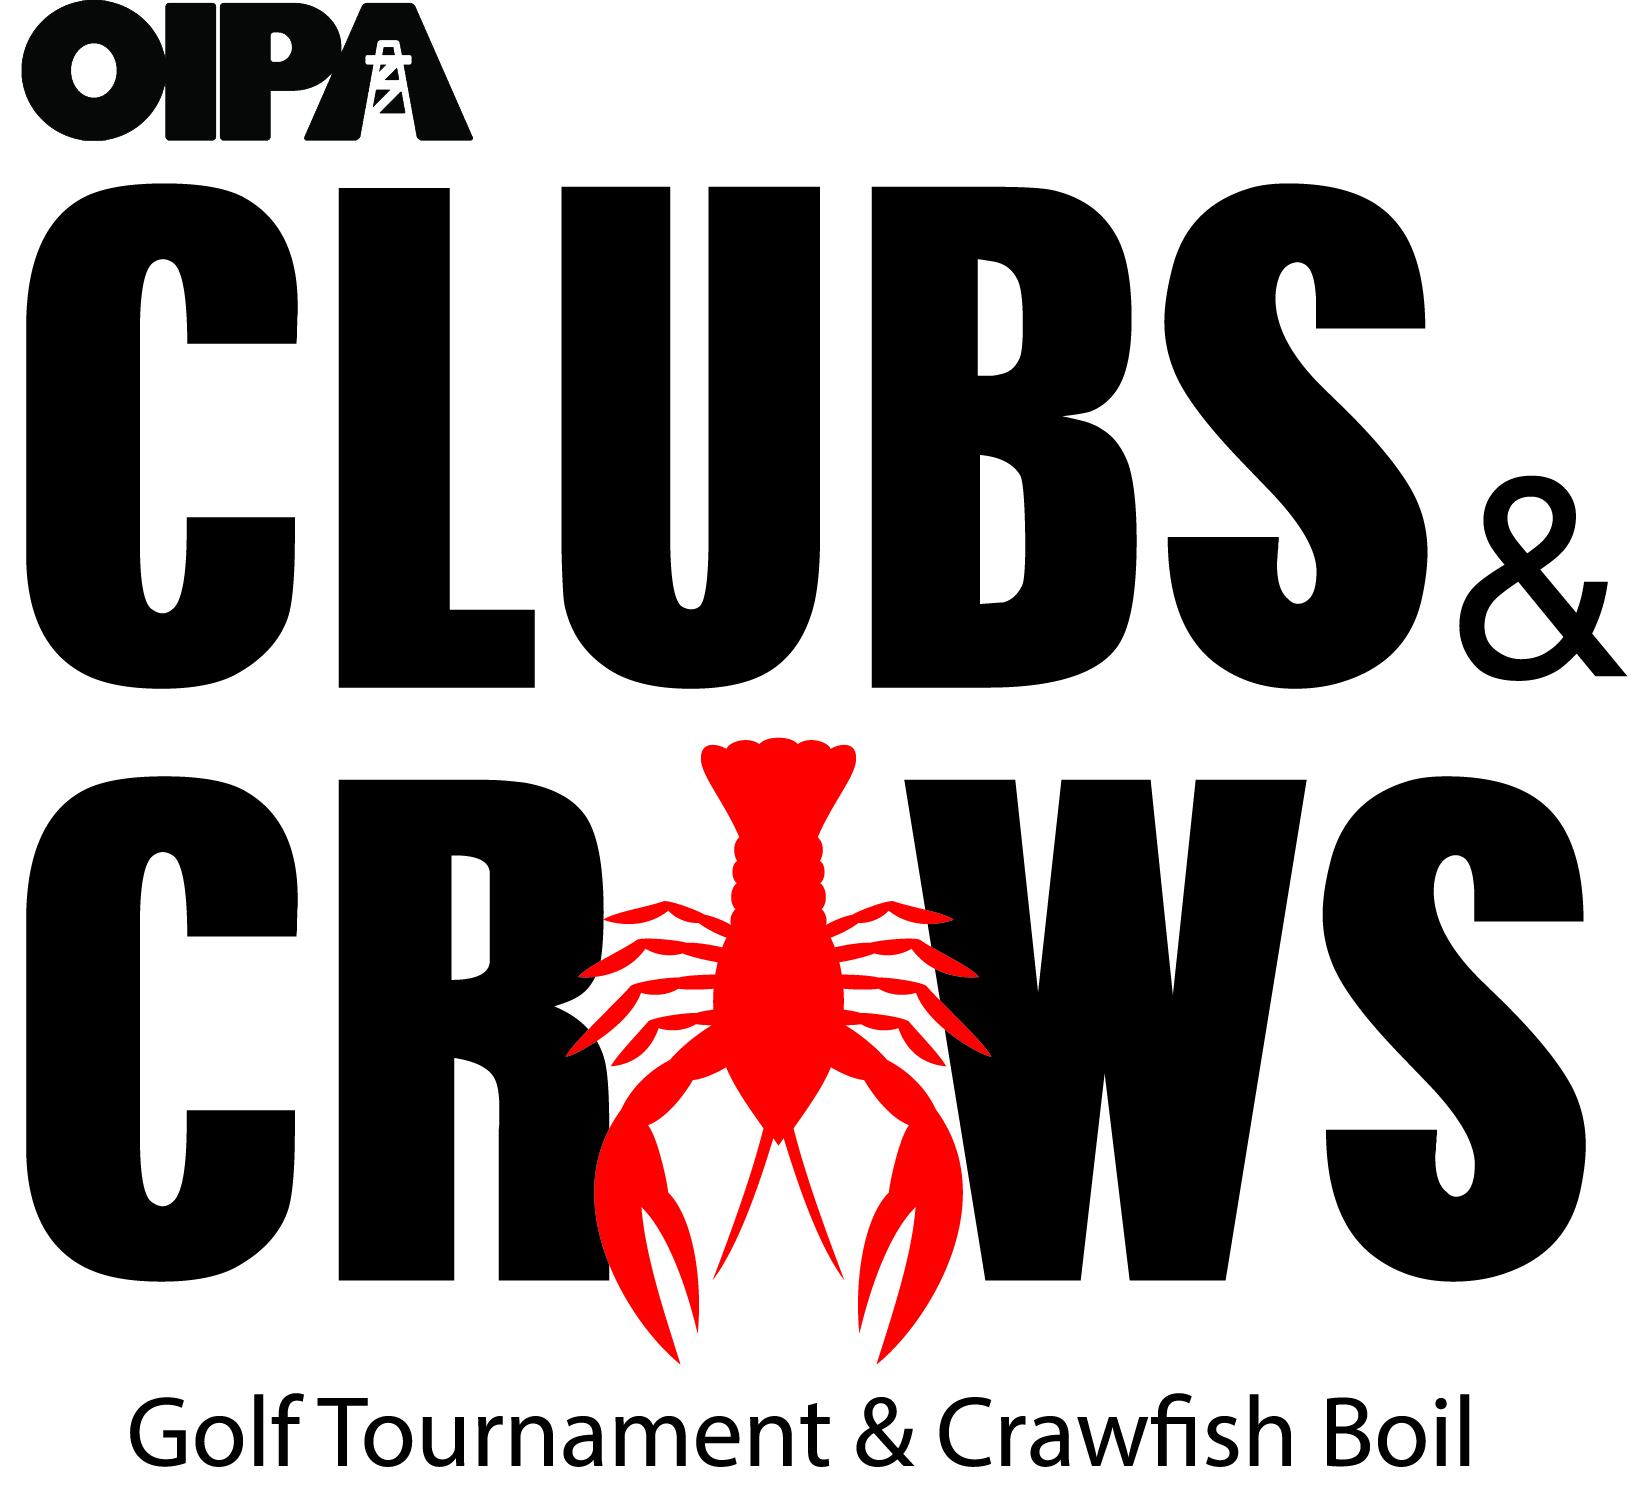 OIPA Clubs & Craws 2018